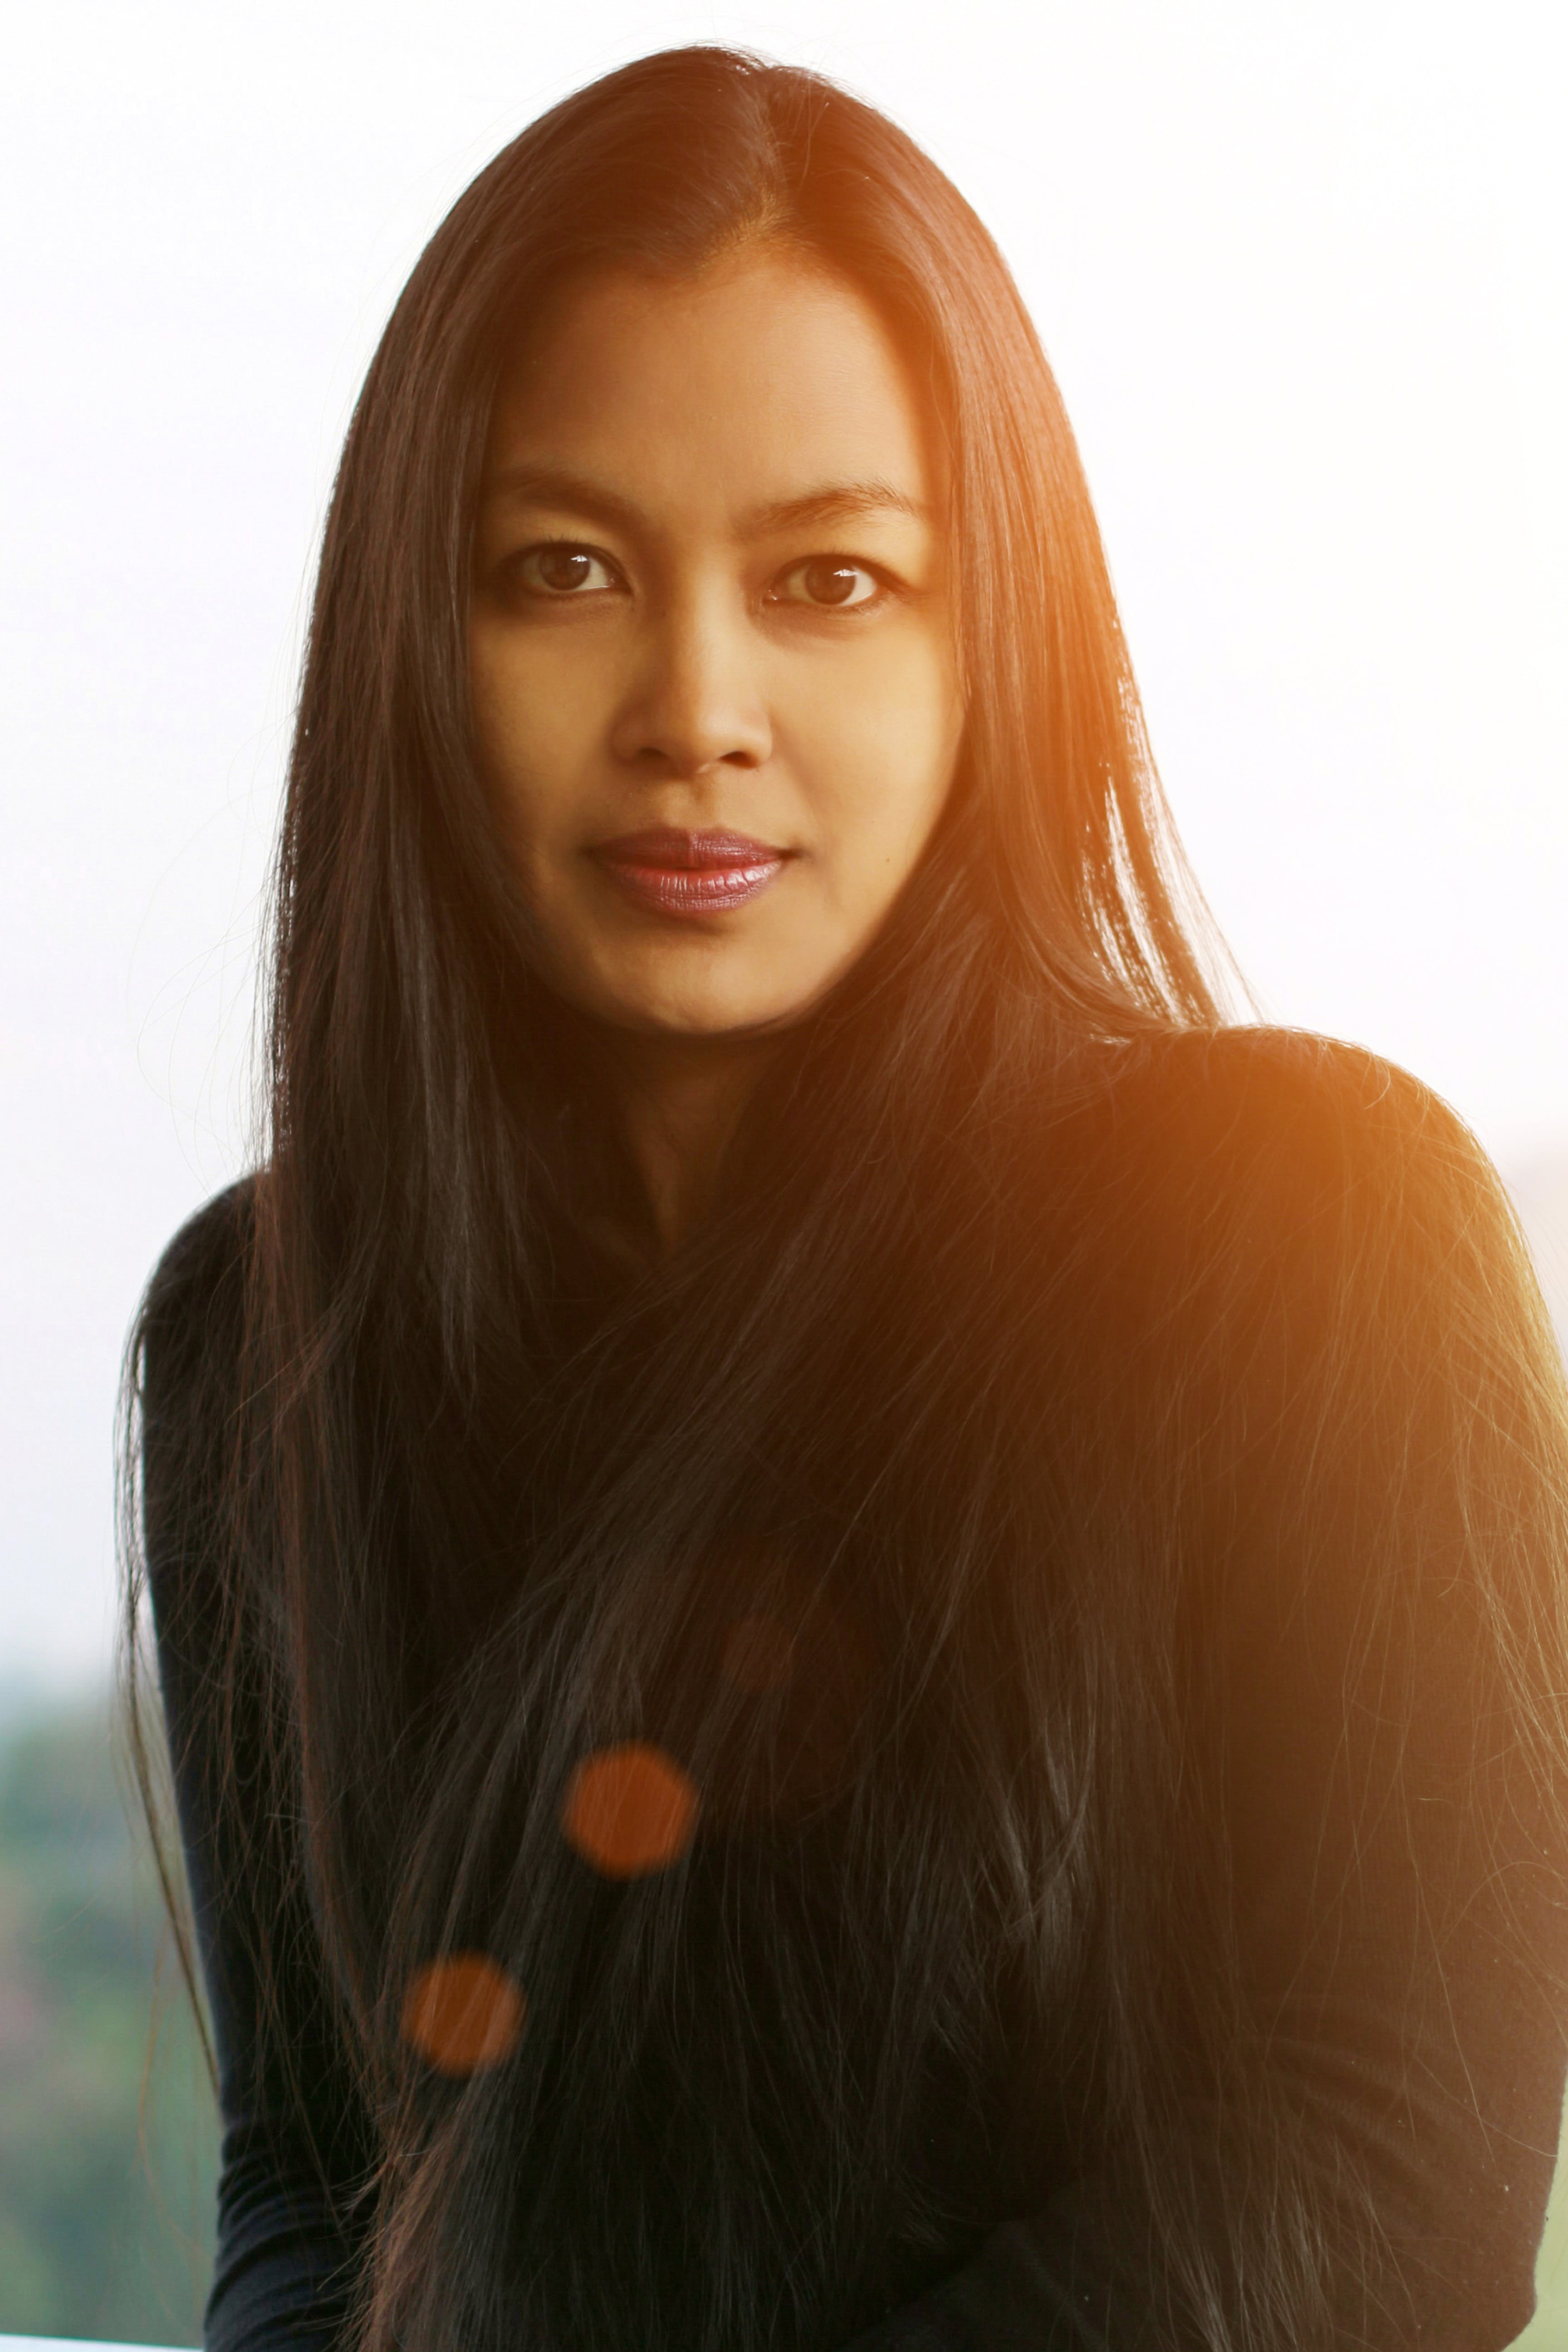 Woman Wearing Black Long-sleeved Shirt